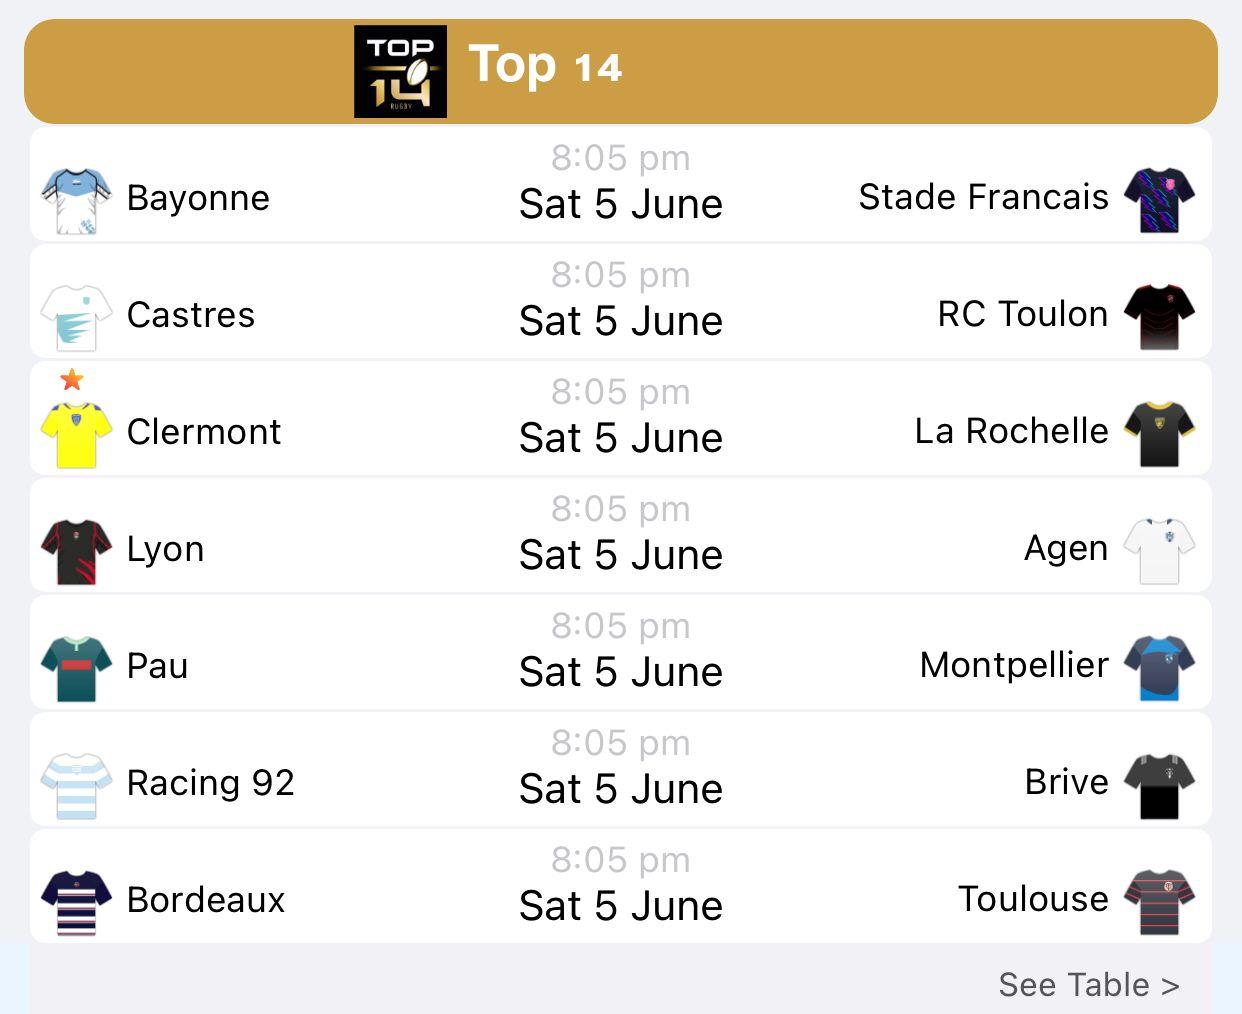 Round 26 fixtures of the TOP14 2020/21